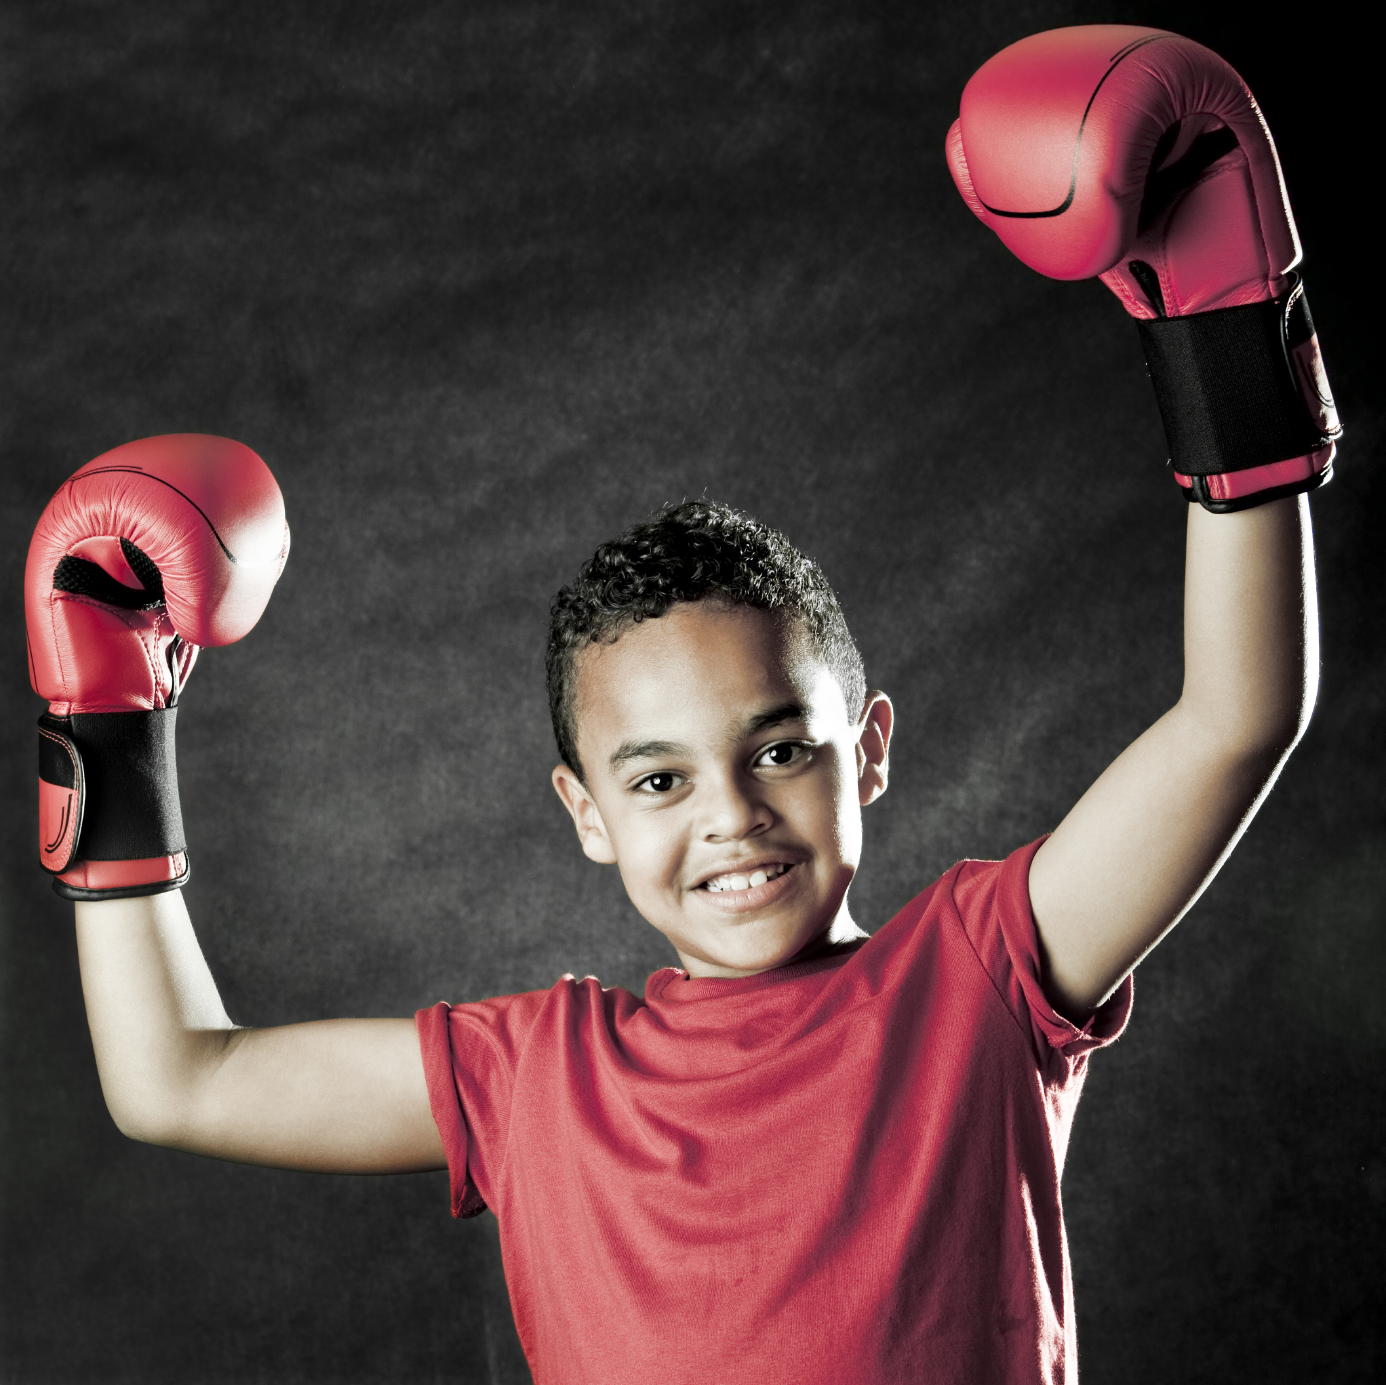 Фото картинки про бокс дети